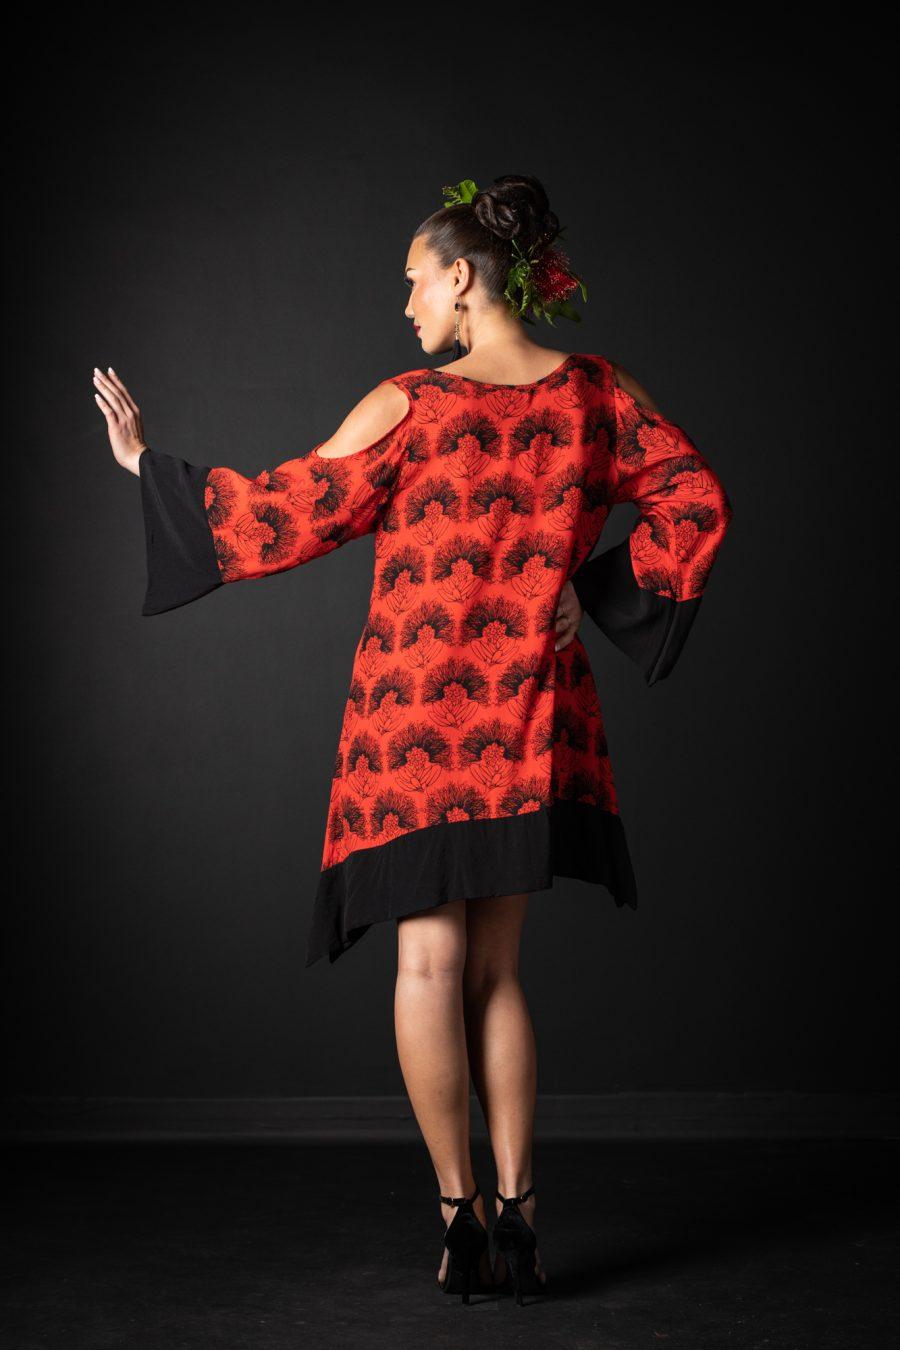 Model wearing Kamakana Top with Pocket in Firey Red-Black Kalihilehua Pattern - Back View